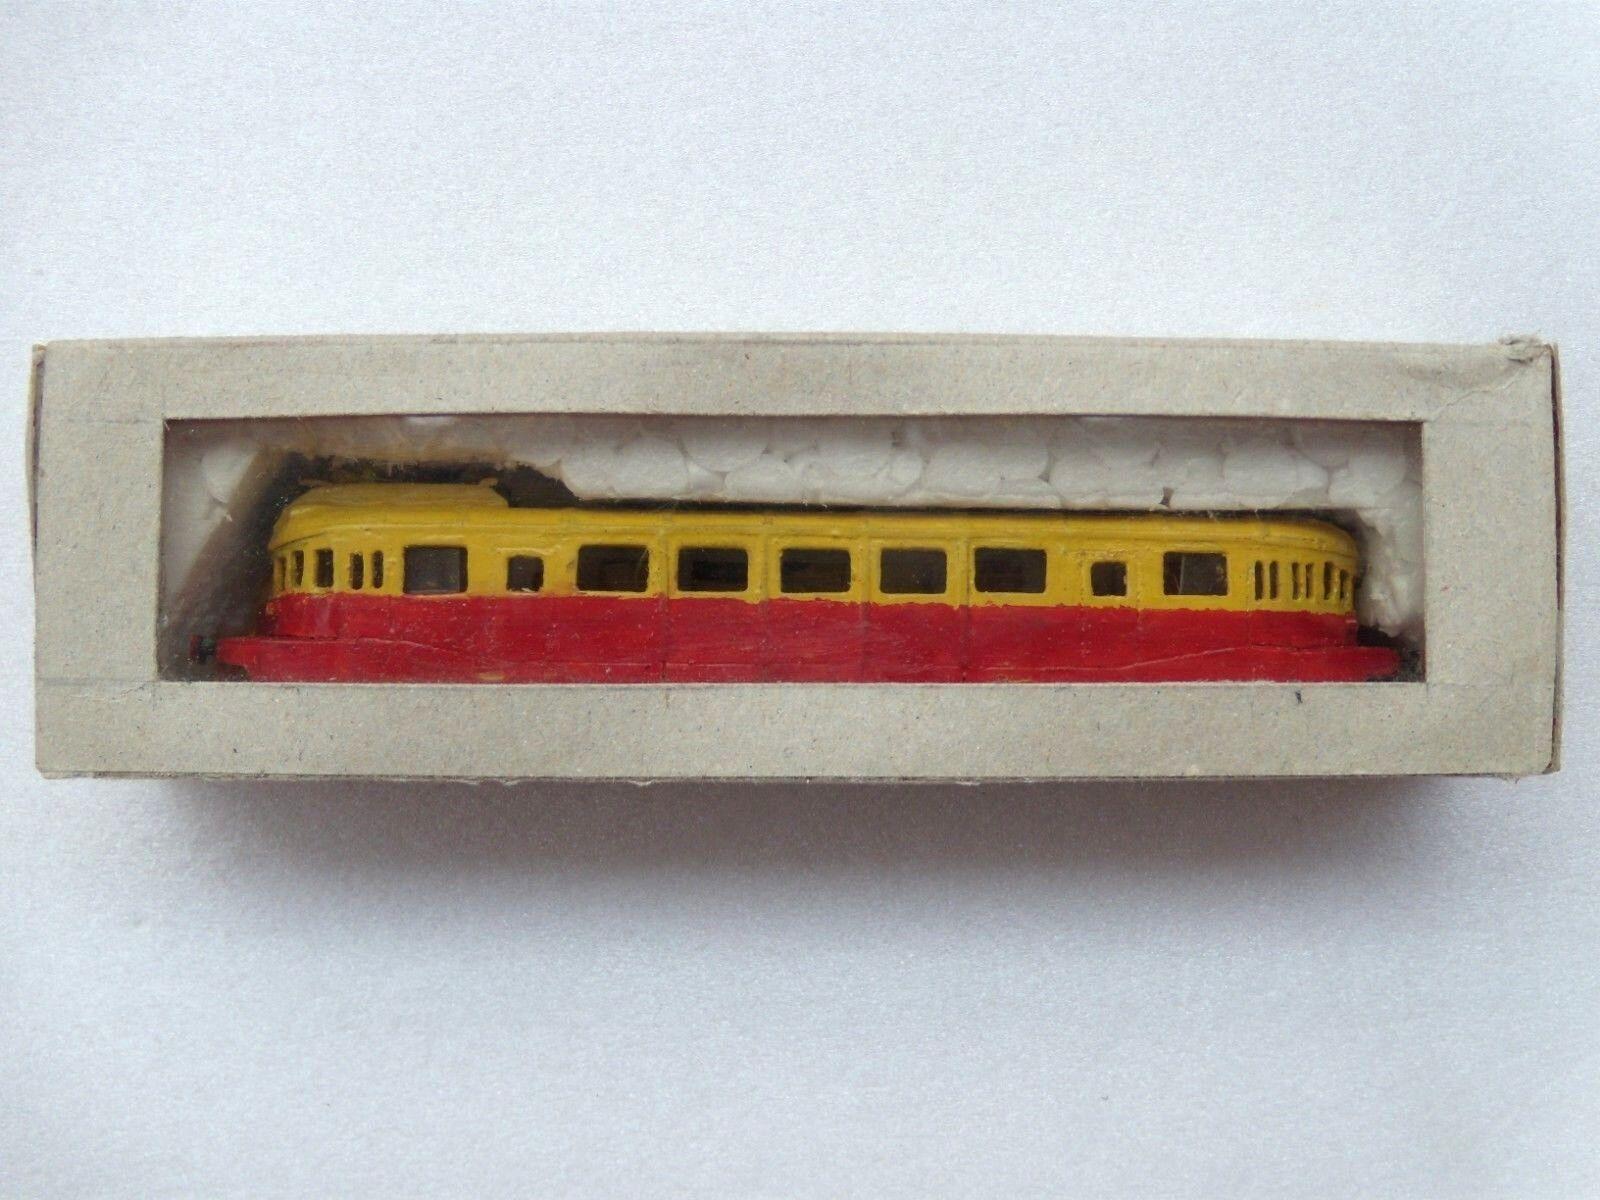 contador genuino Autorail VH SNCF échelle échelle échelle N  comprar barato